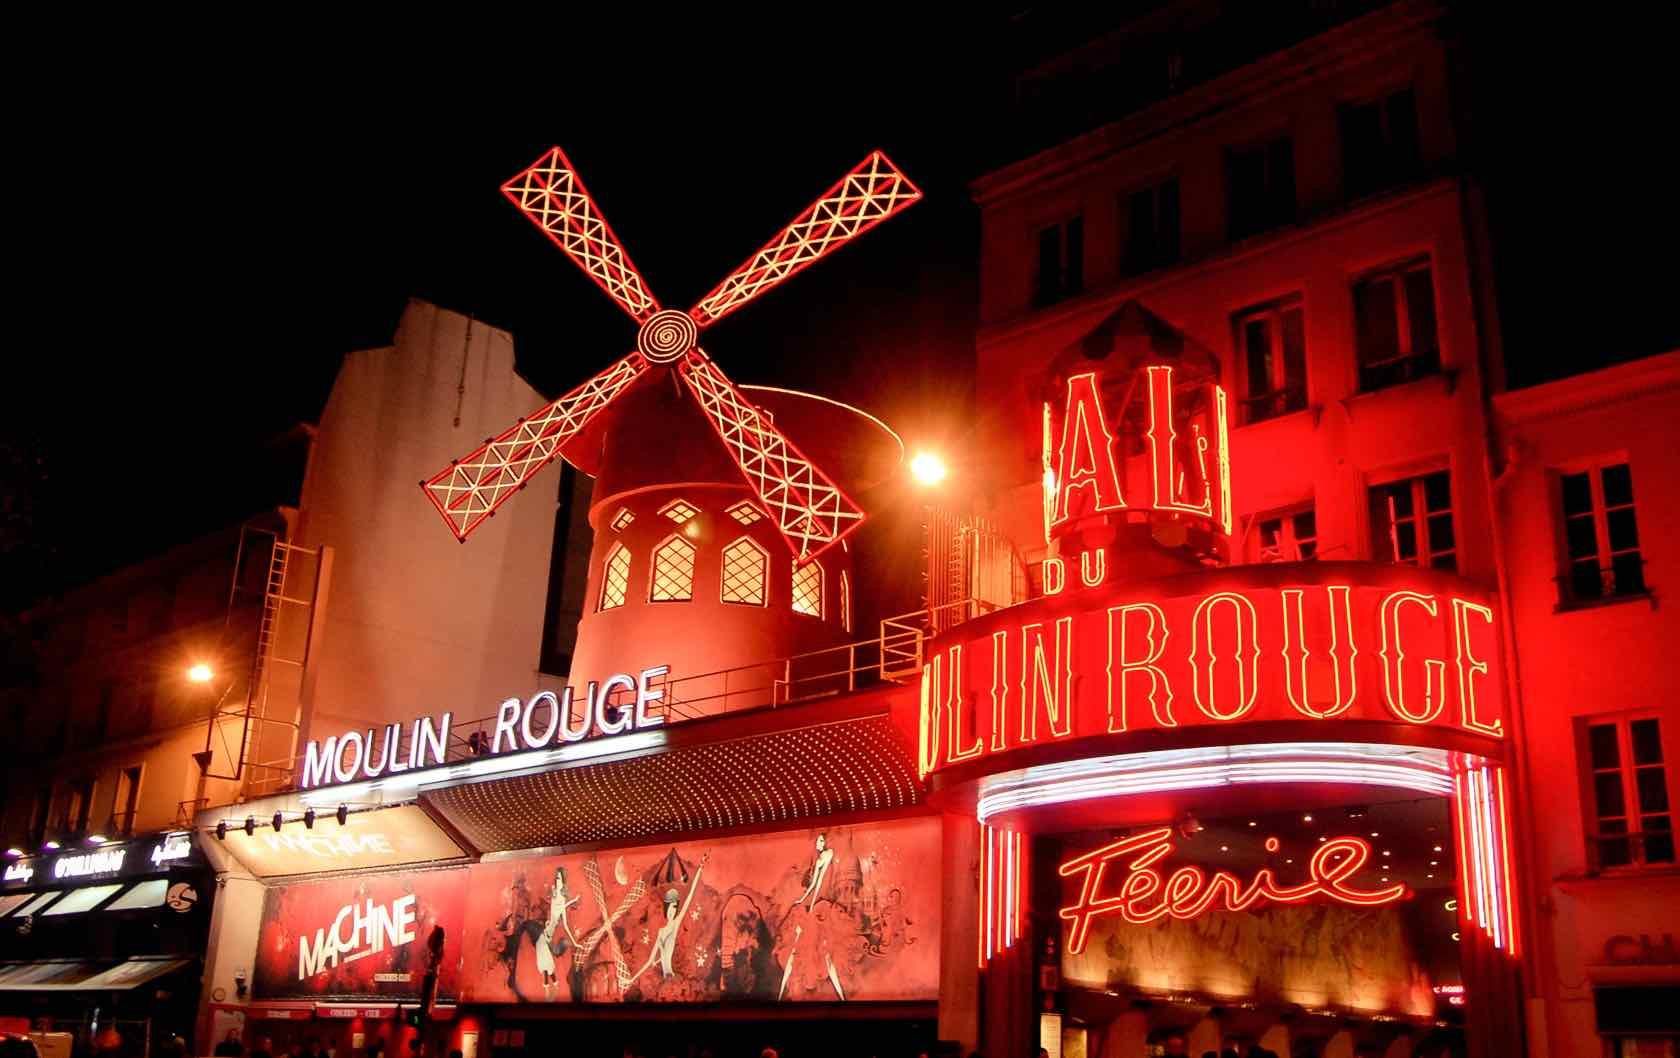 Paris into your home Moulin Rouge